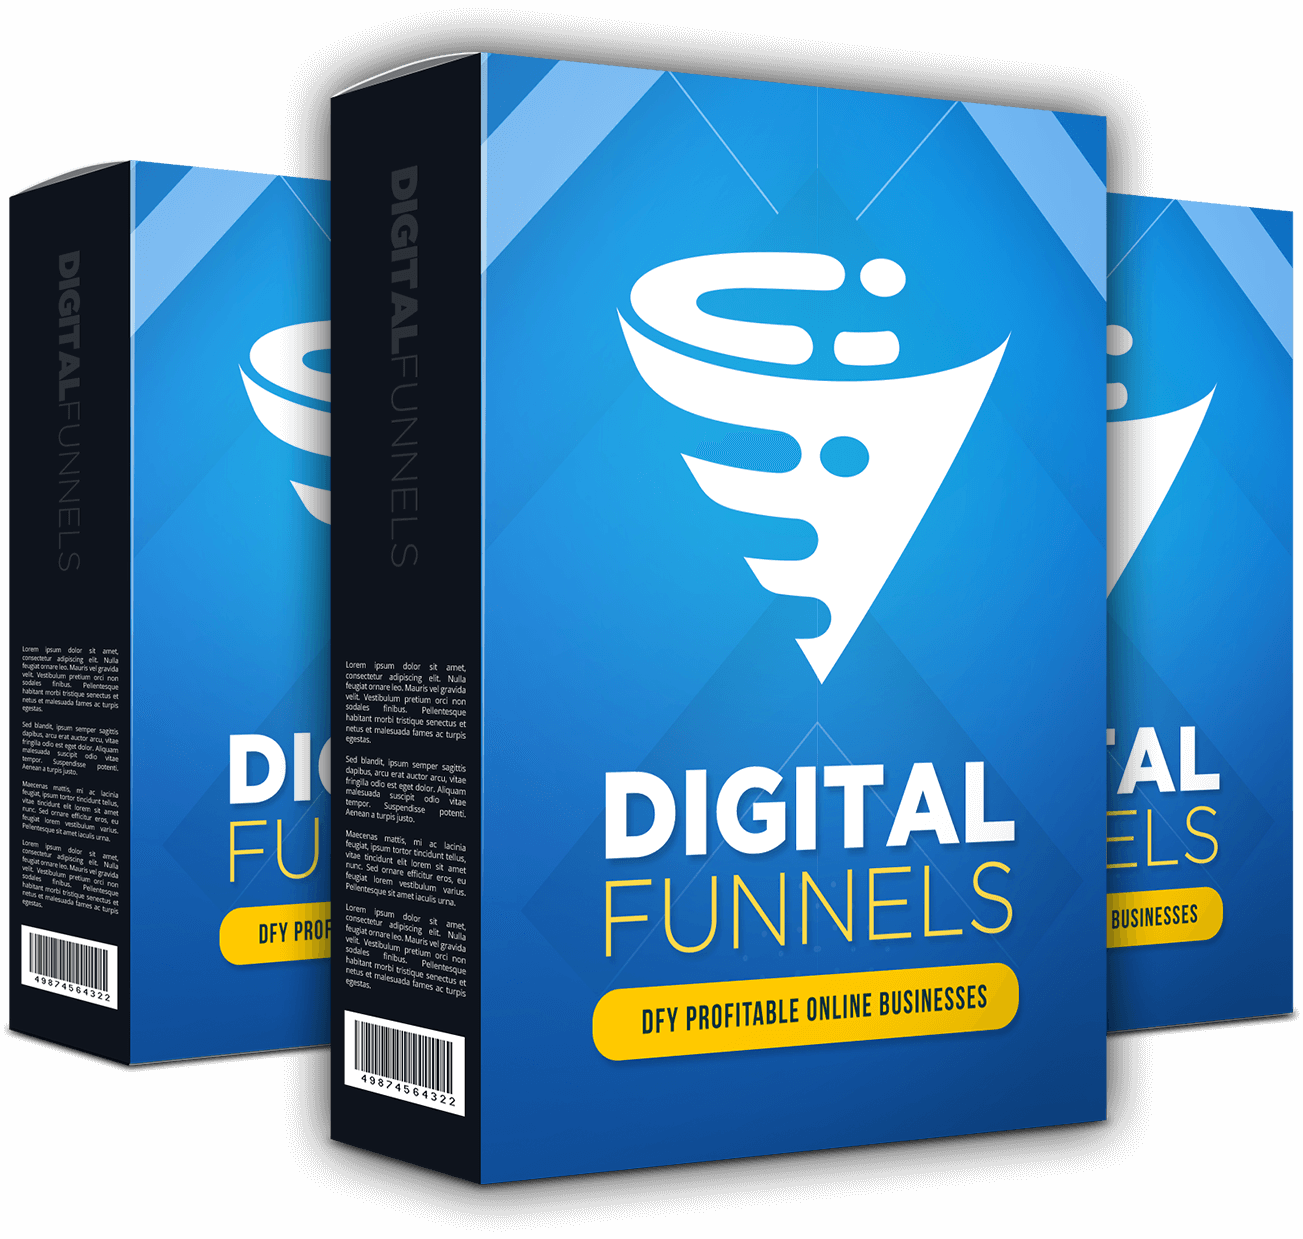 Digital-Funnels-Review